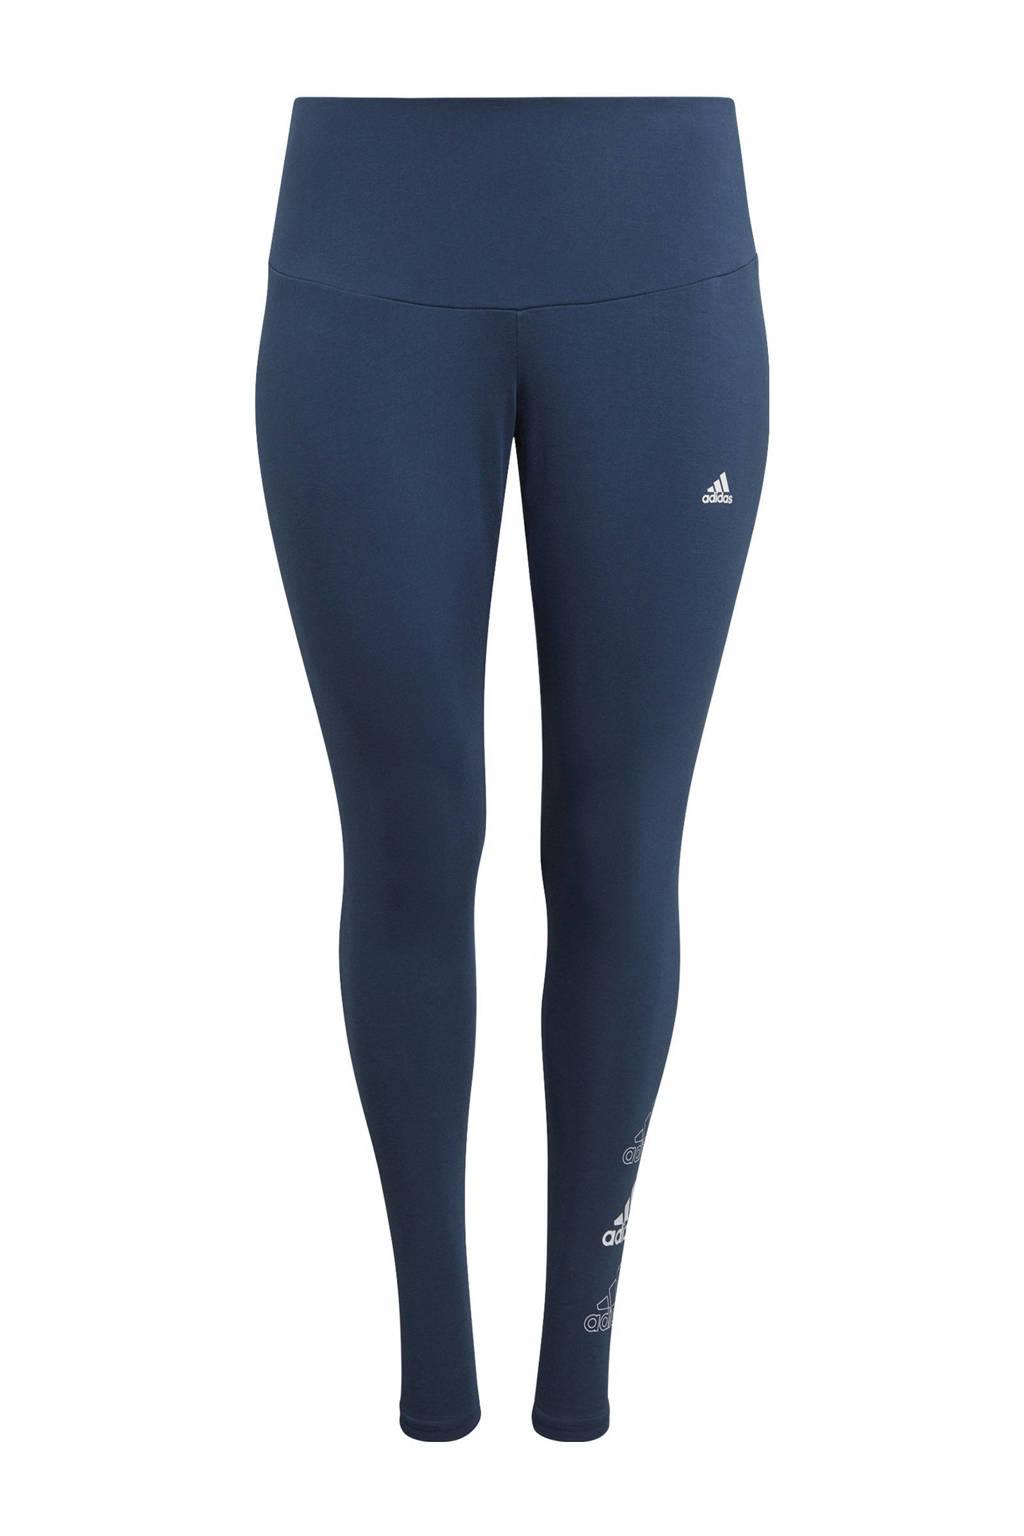 adidas Performance Plus Size sportlegging donkerblauw, Donkerblauw